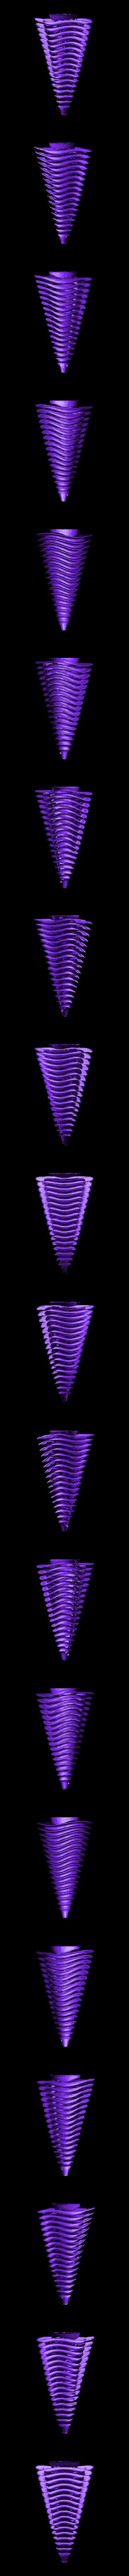 MiniTree.stl Download free STL file Christmas tree - Christmas tree ornament • 3D printer model, Gophy